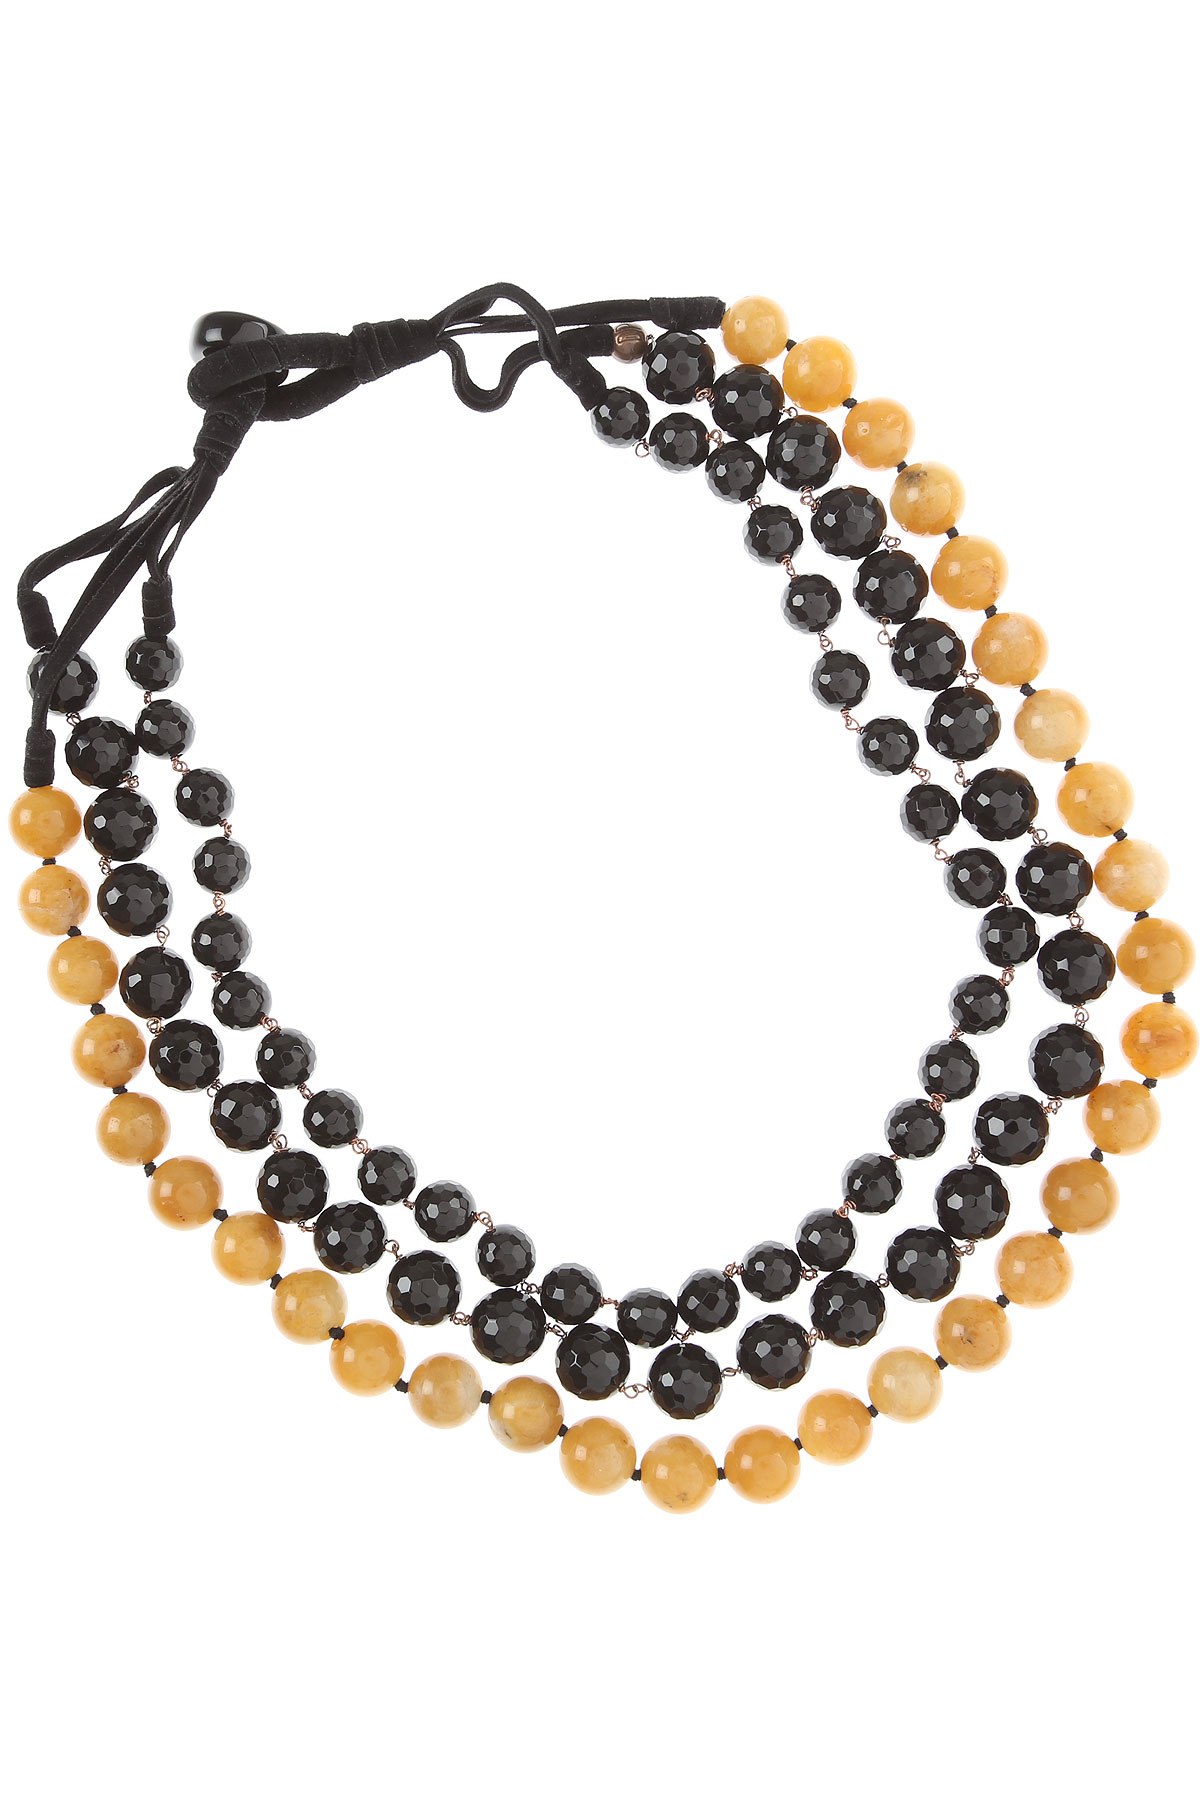 Donatella Pellini Necklaces On Sale, Black, Onix, 2019